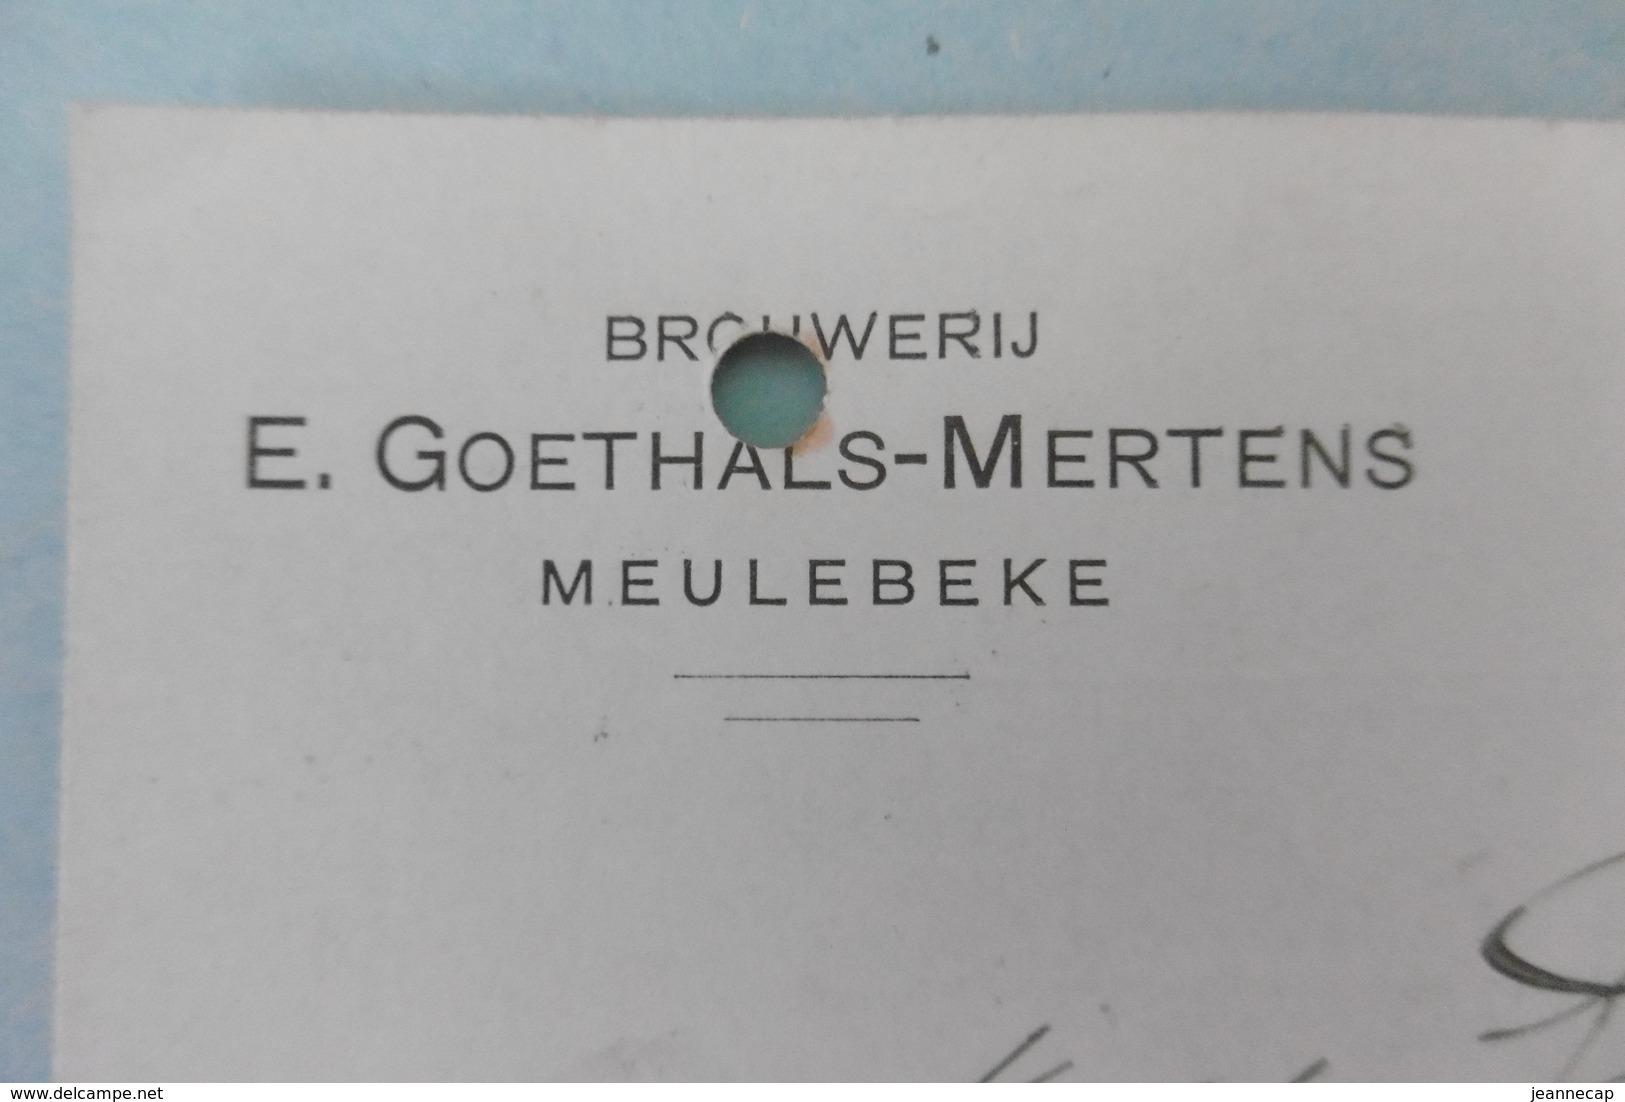 PW-EP 5 C Pellens, Brasserie-brouweri MEULEBEKE, Brouwer Brasseur Goethals-Mertens, 16-10-1912, Signé - Entiers Postaux